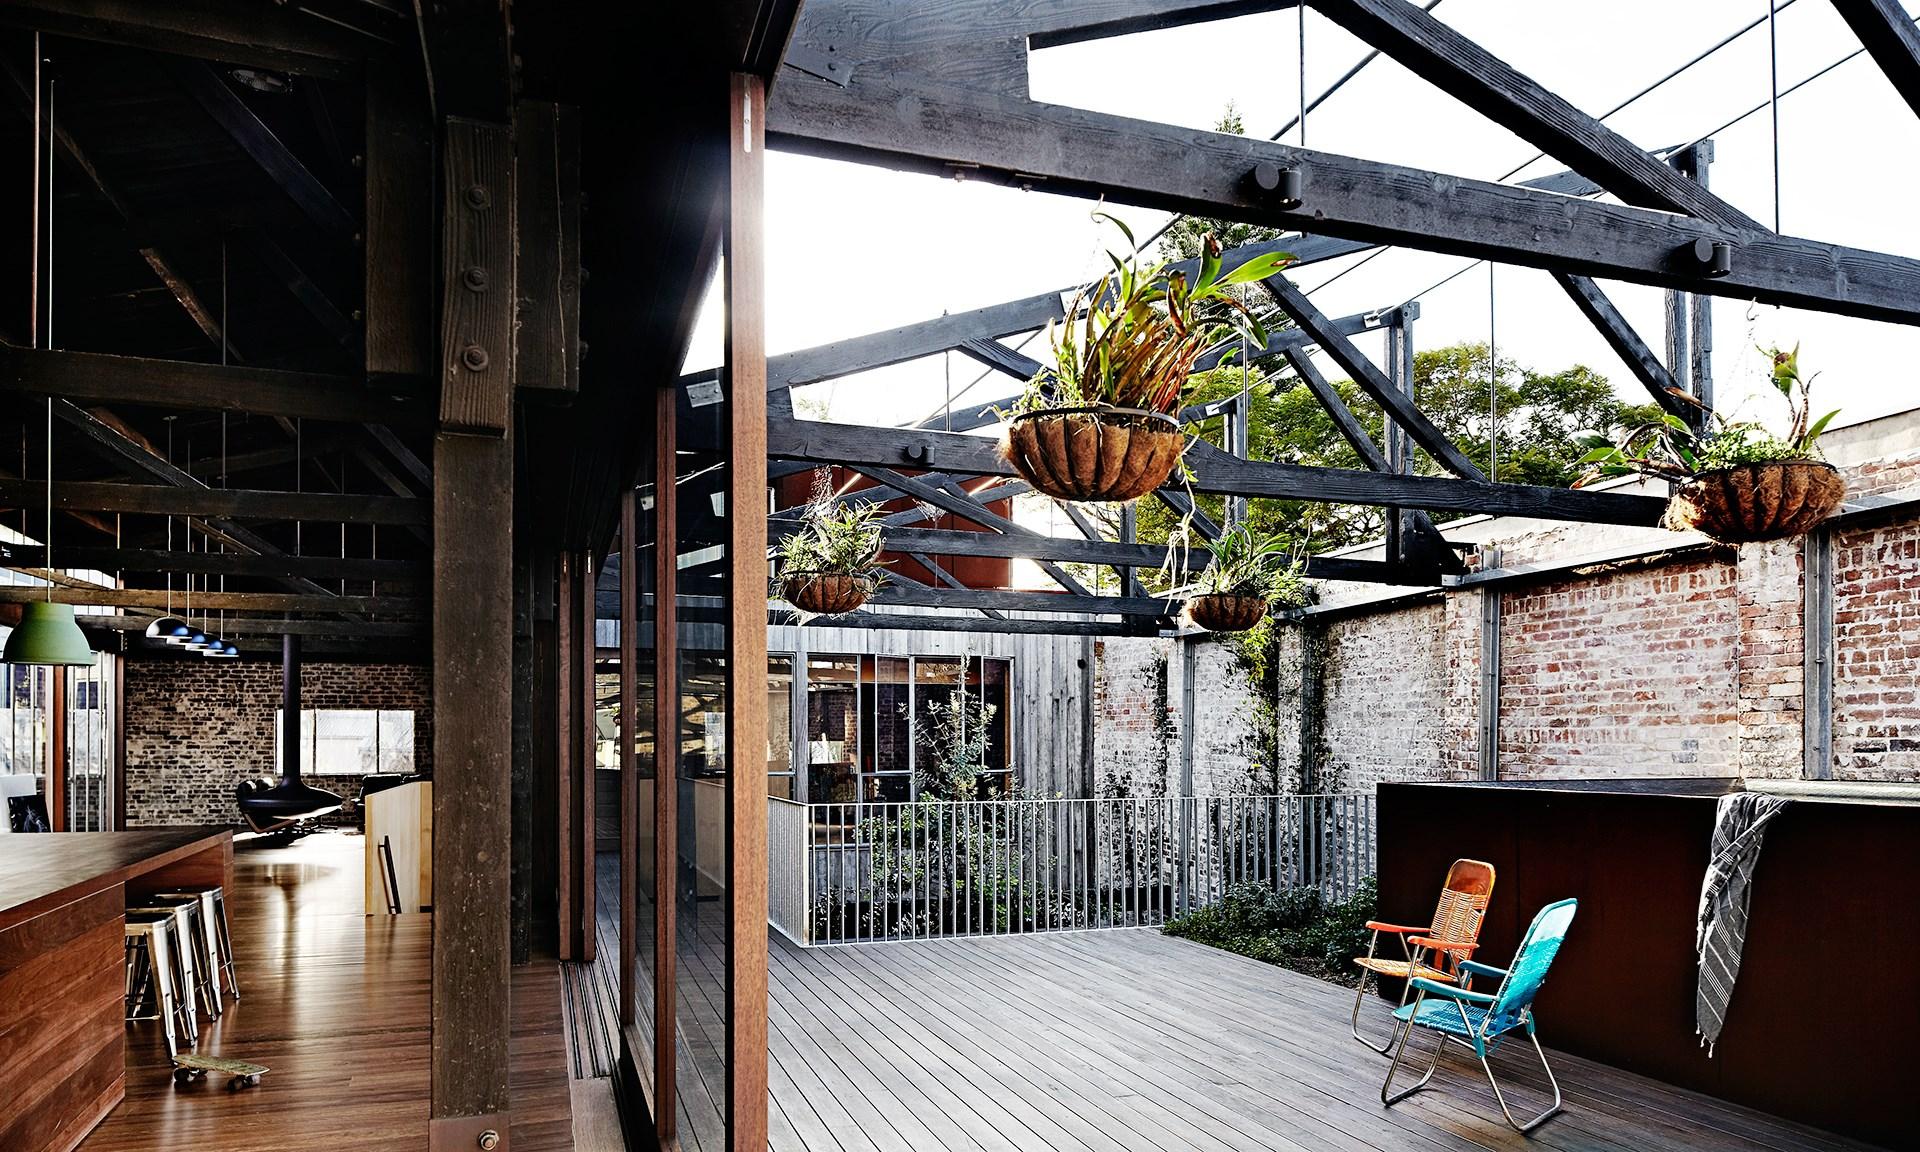 [Merrick Watts' sleek and stylish warehouse conversion](http://www.homestolove.com.au/inside-comedian-merrick-watts-happy-home-3465). Photo: Sharyn Cairns / *real living*